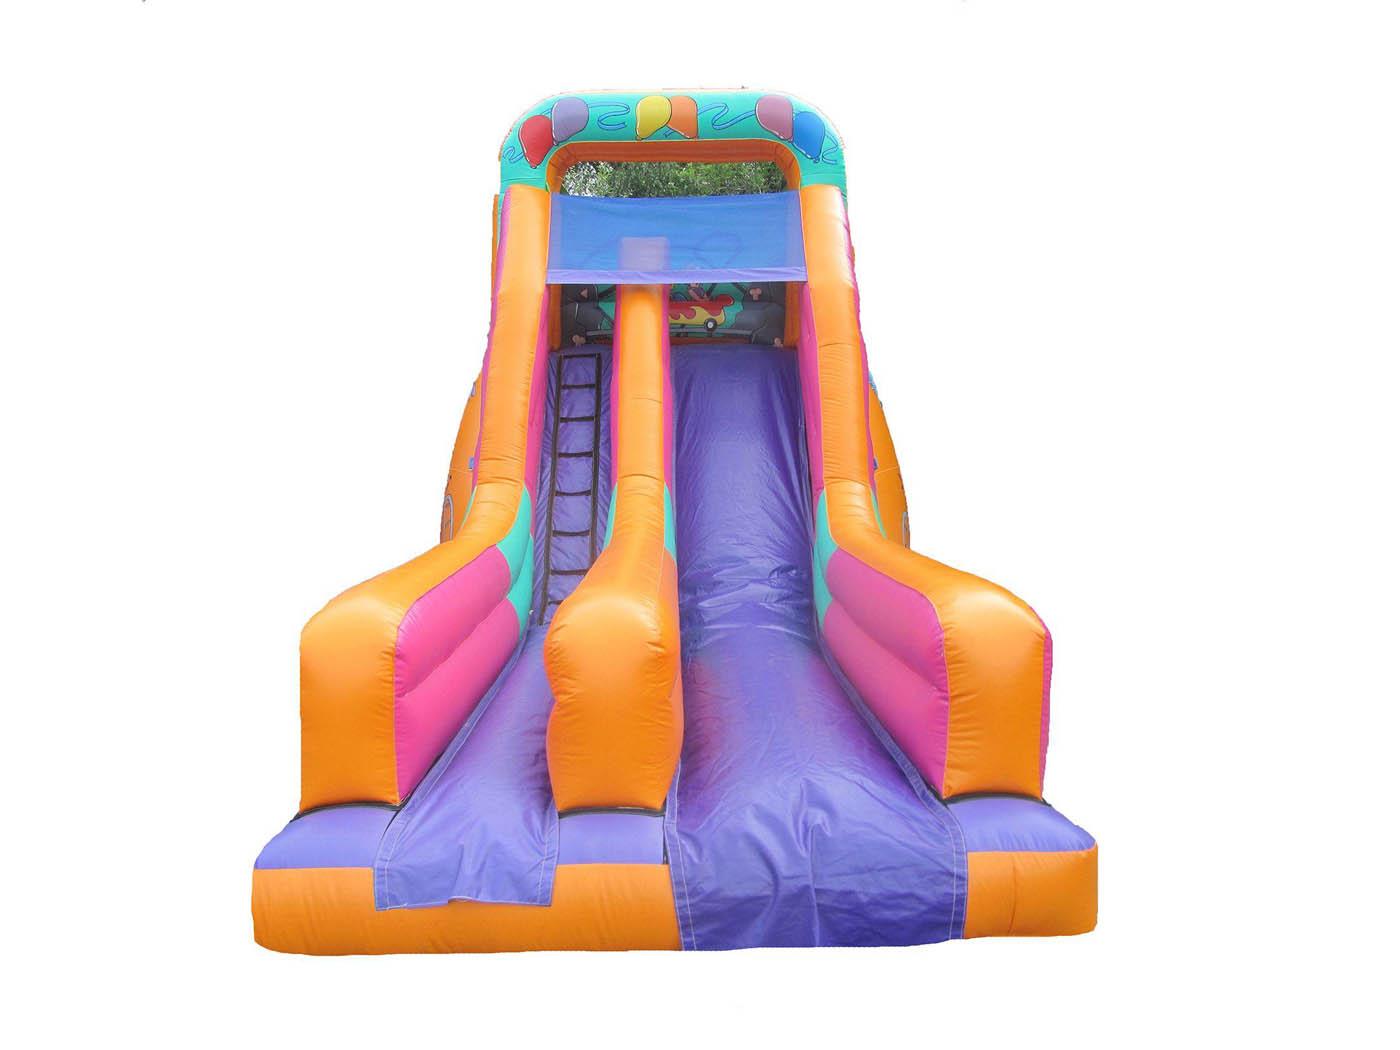 Super Mega Bouncy Slide